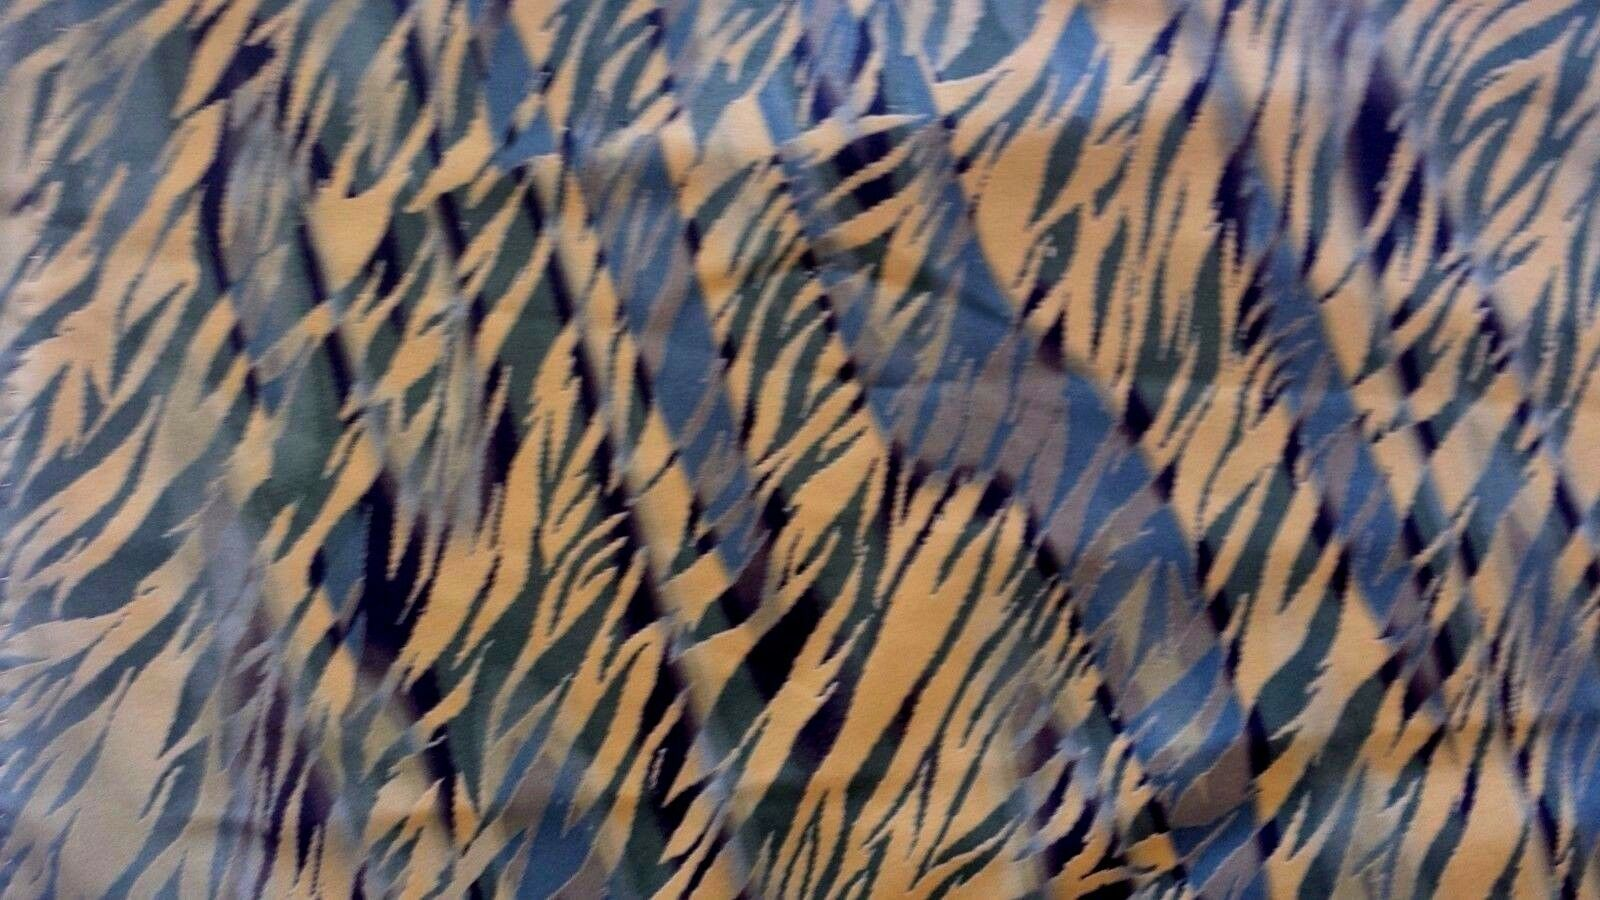 Stylish Golf/Casual Animal Print Golf Dress with Shortie - GoldenWear image 6